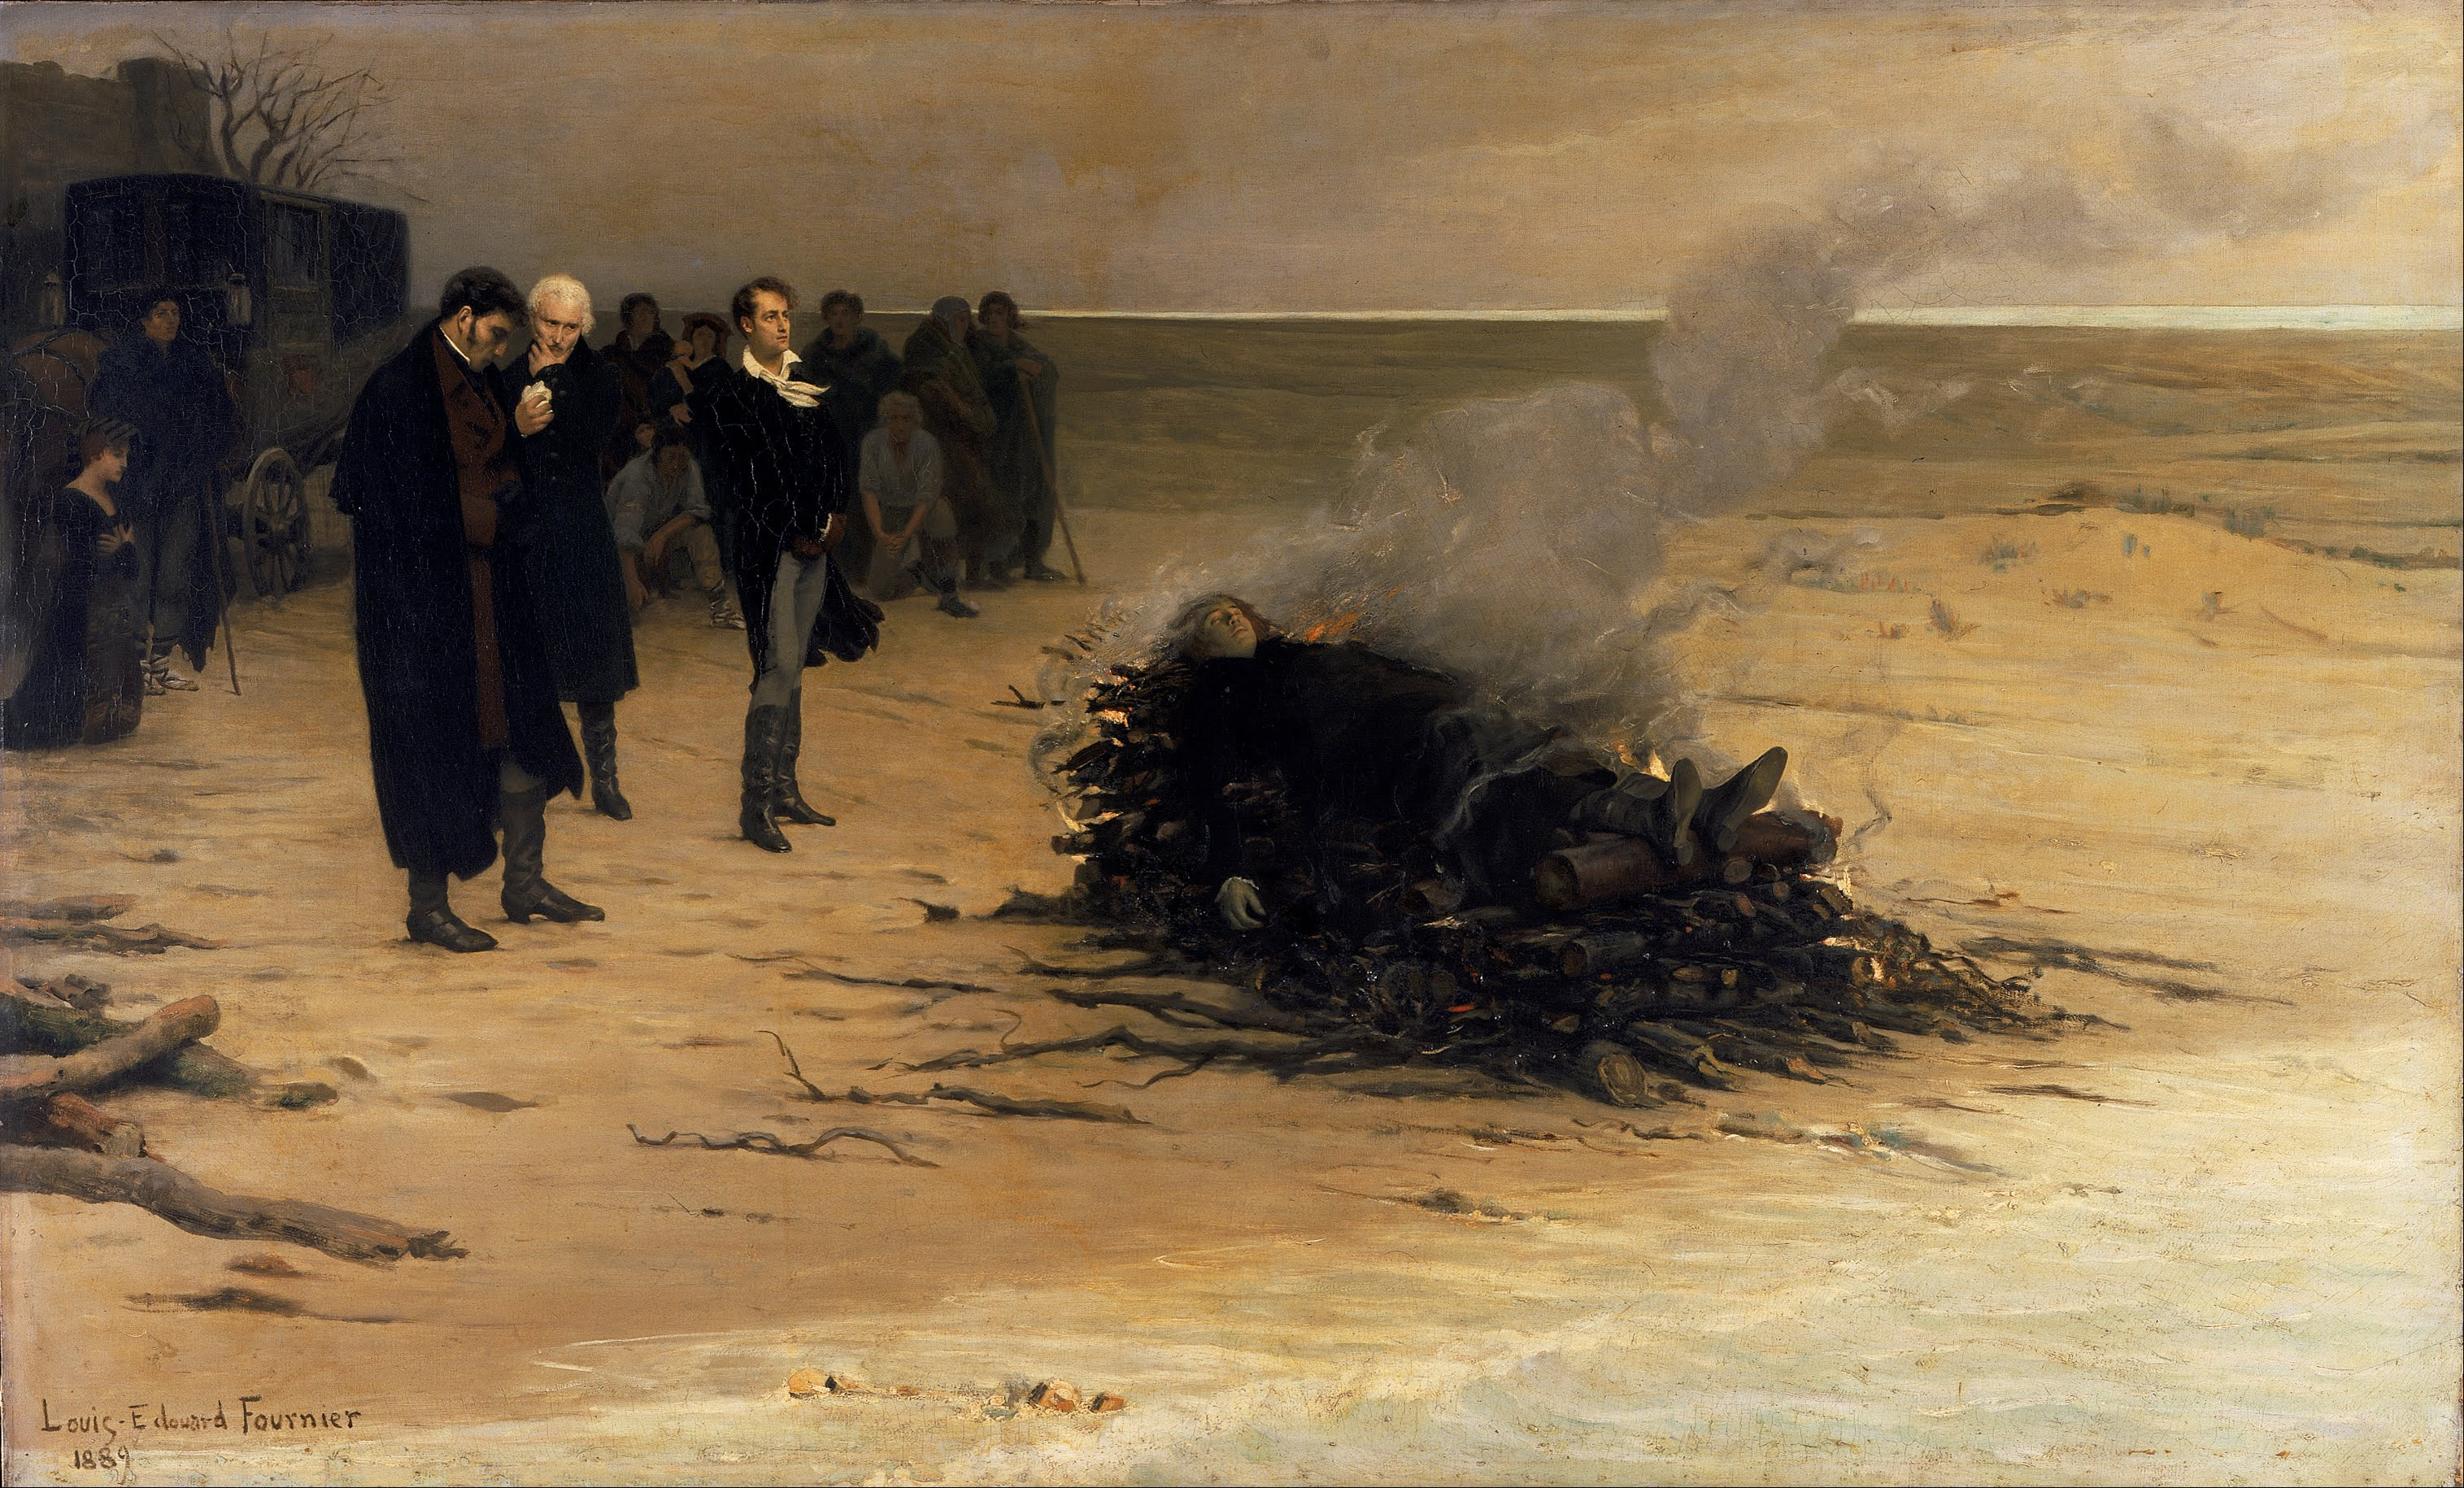 Burial & Ash Scattering Ceremony at Sea in Long Beach, San Pedro, Huntington Harbor & Alamitos Bay